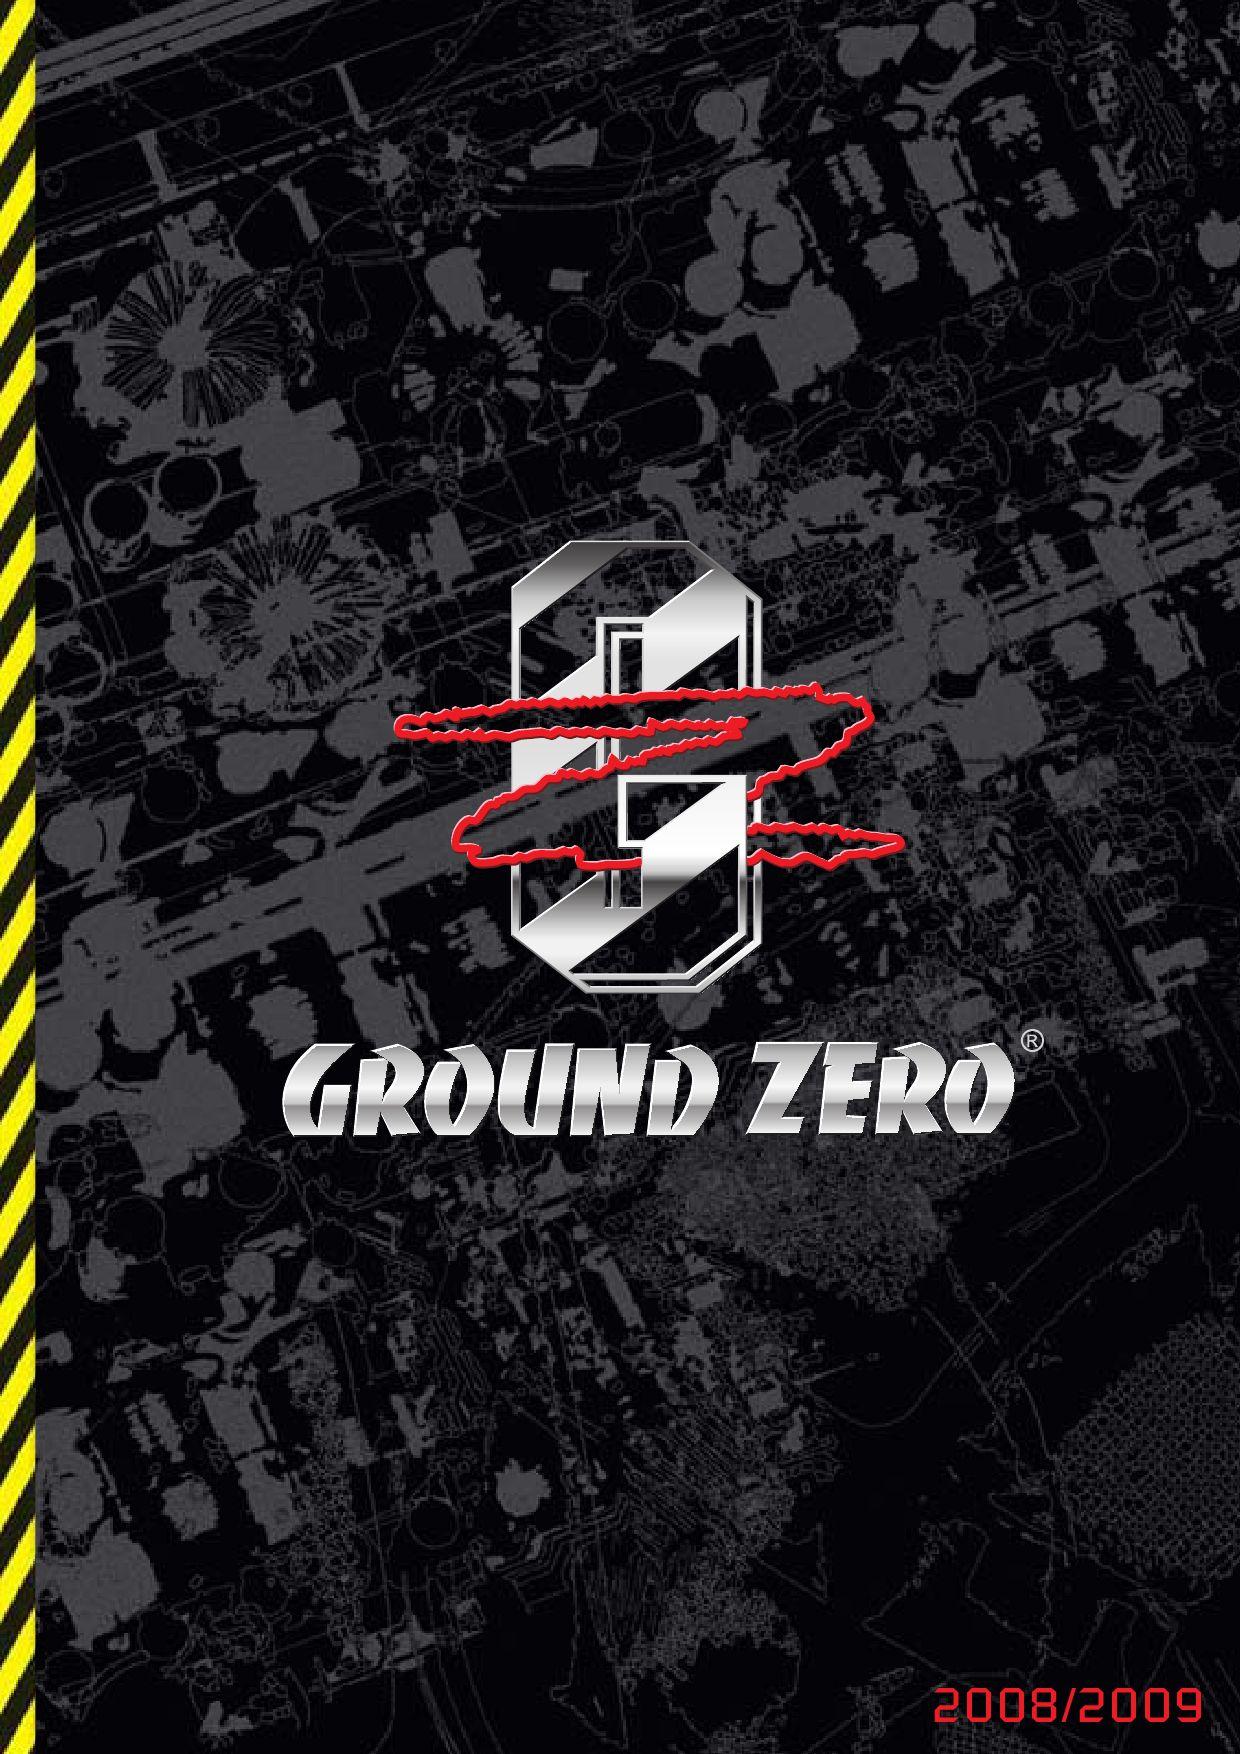 ground zero uk brochure 2009 by talk audio online issuu. Black Bedroom Furniture Sets. Home Design Ideas